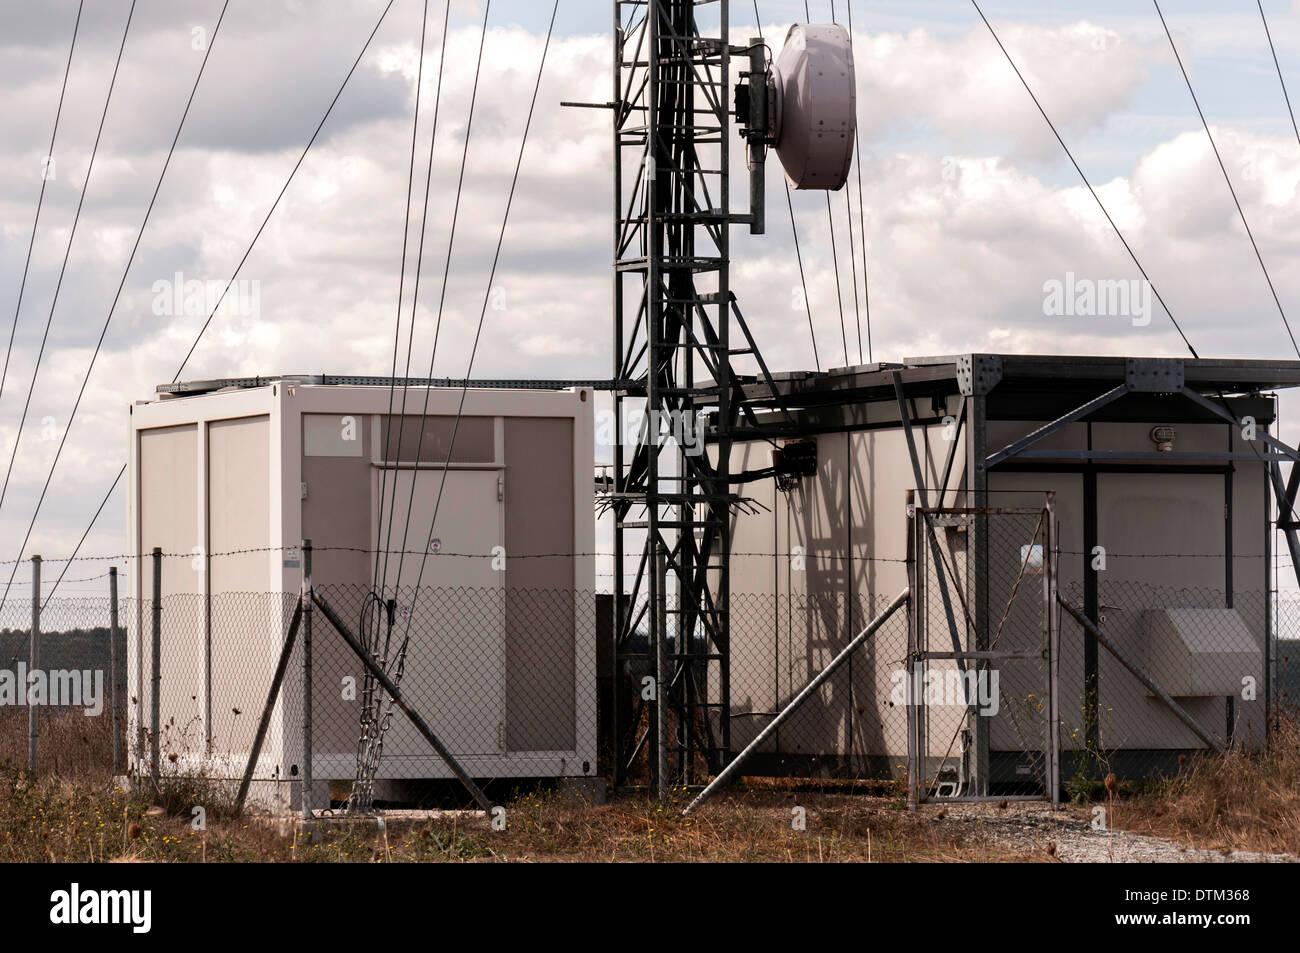 Telecommunications equipment - Stock Image